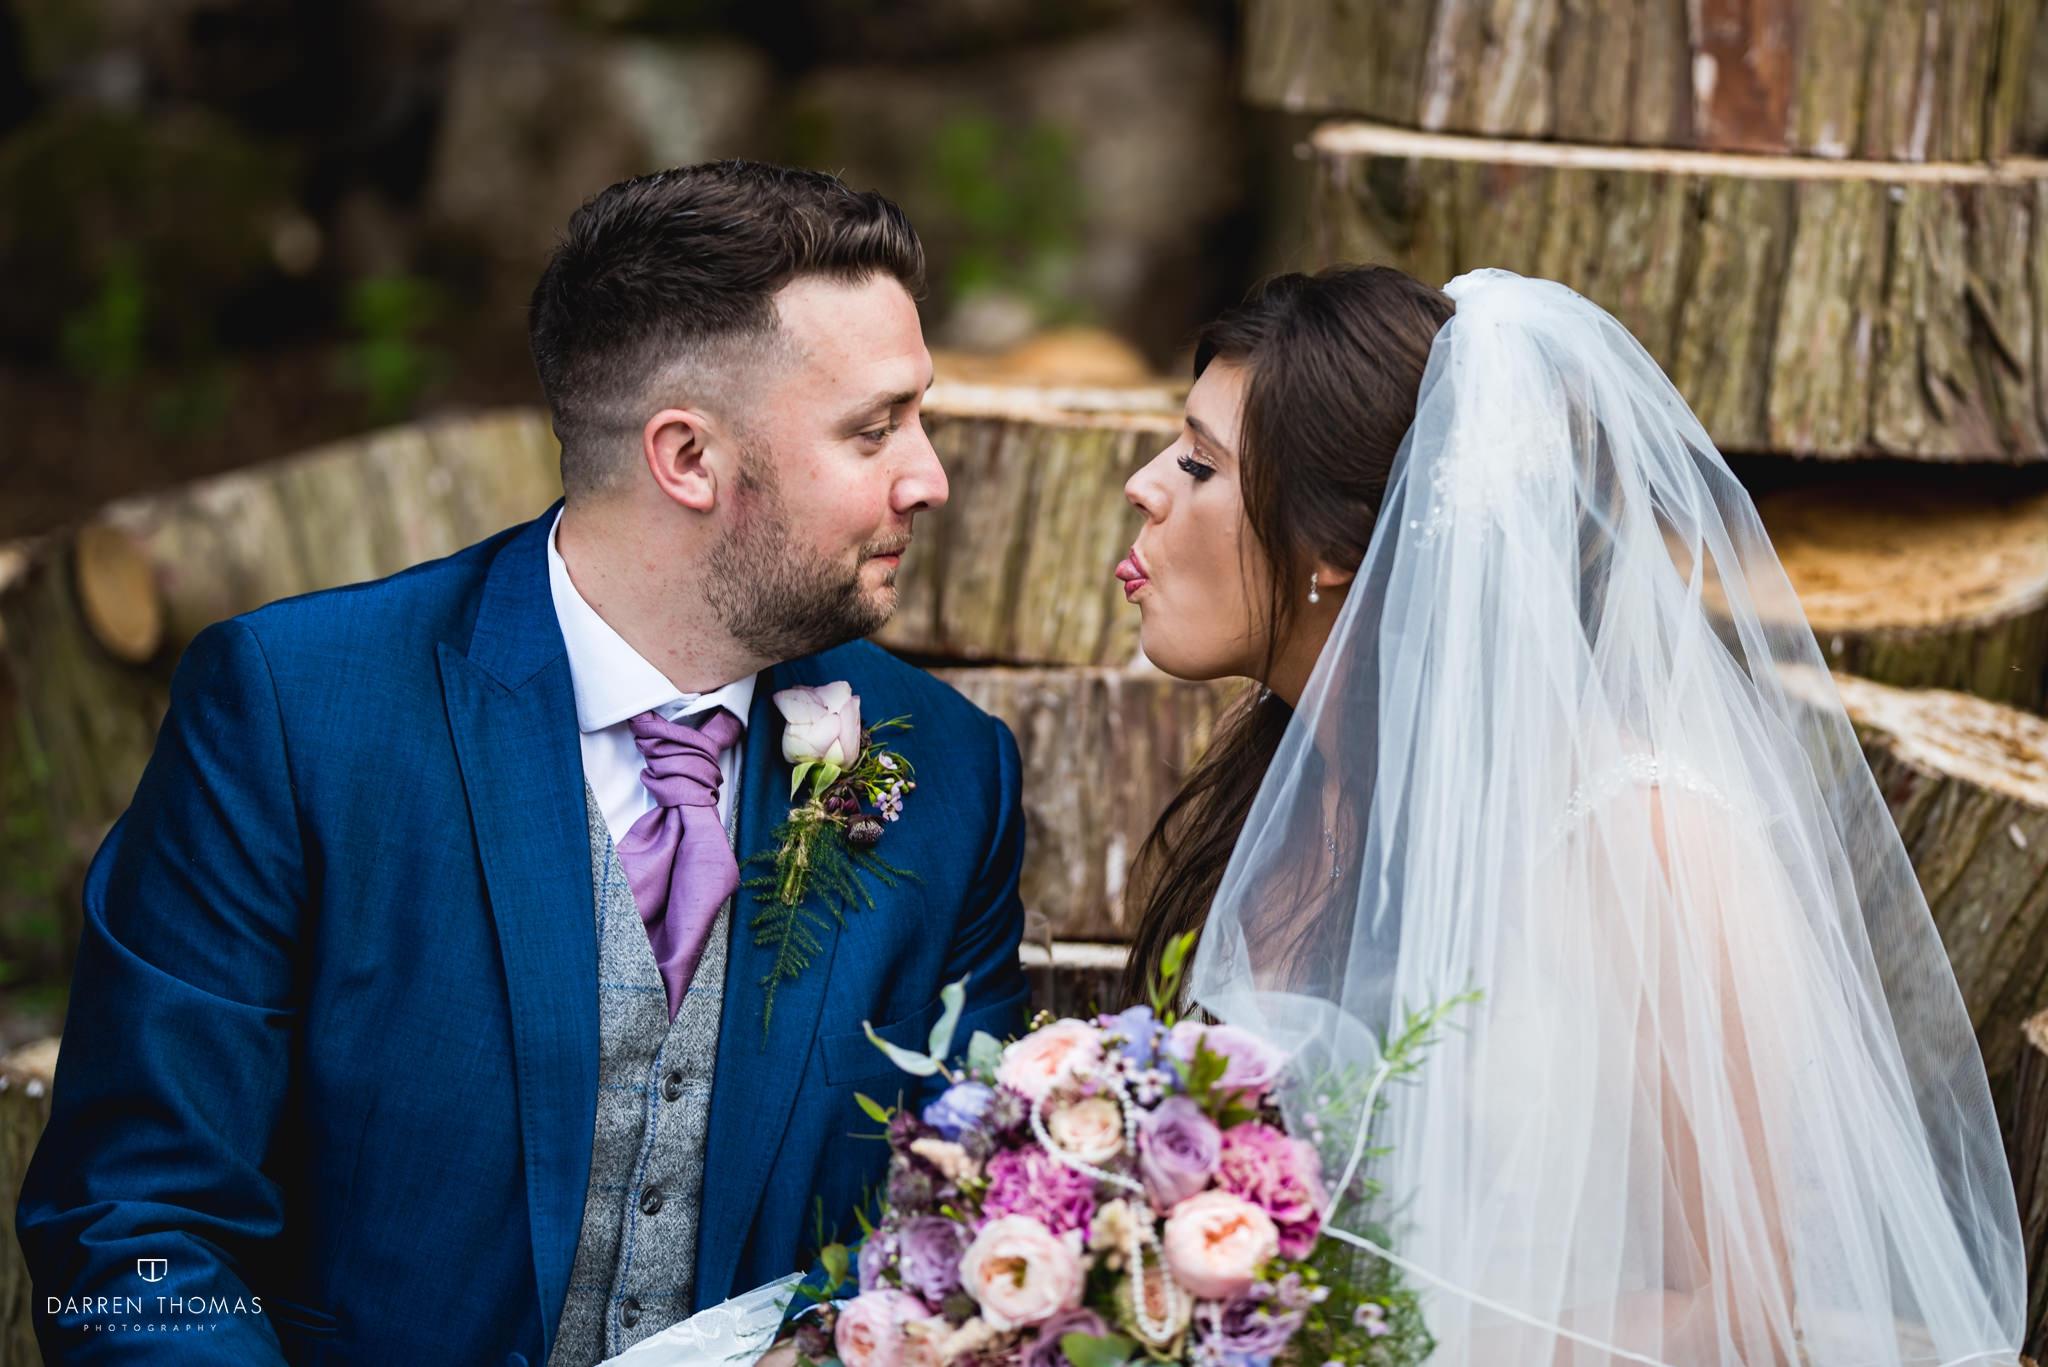 clearwell castle wedding_0021.jpg